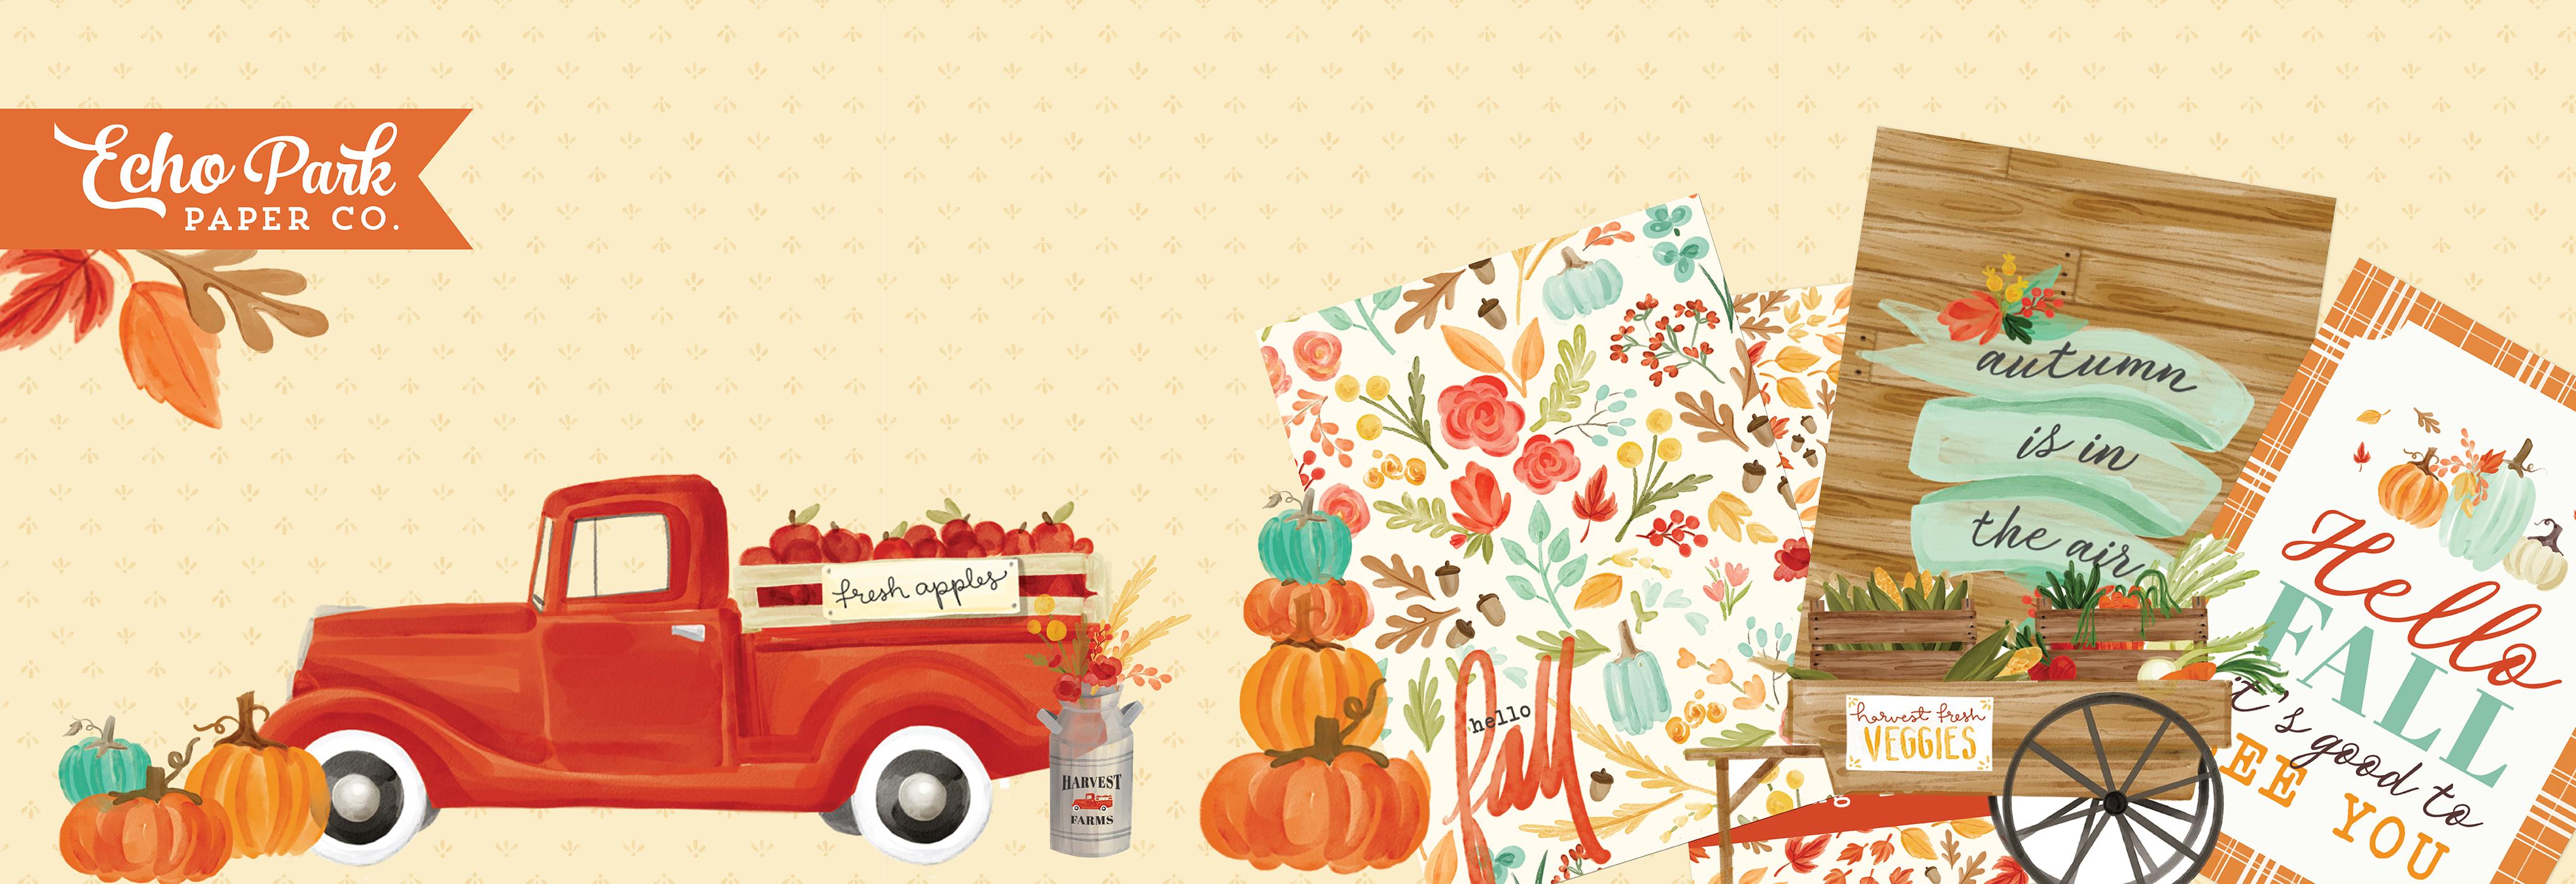 ep-fall-market-snap-click-banner-4083.jpg